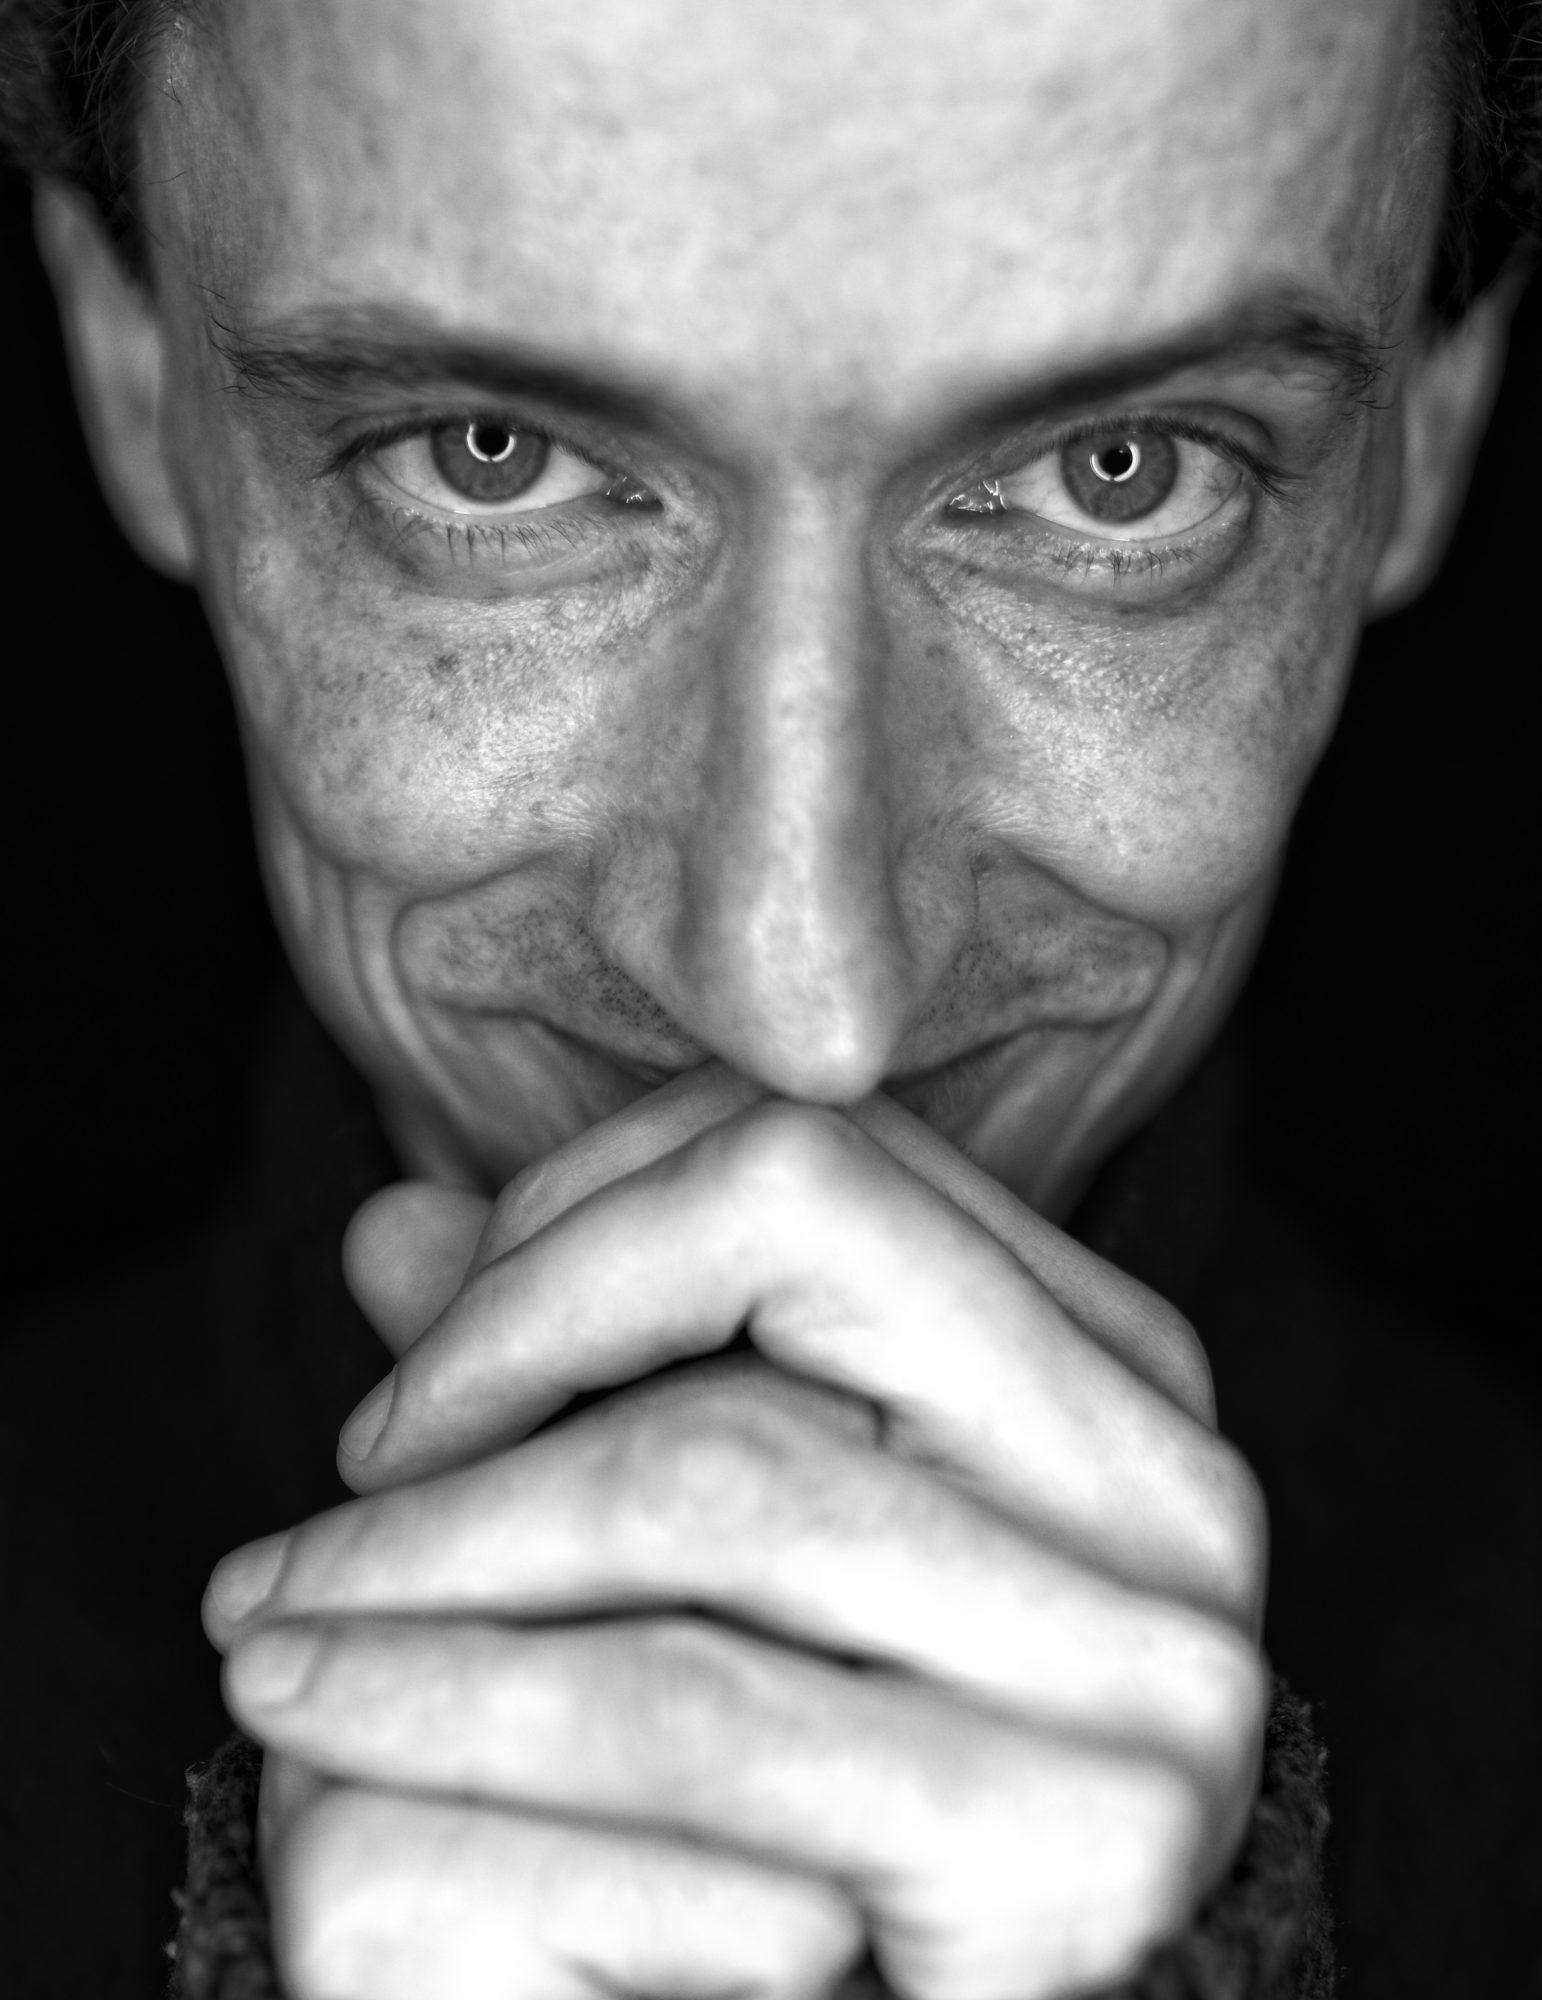 Paul Schlase © Michael Mey